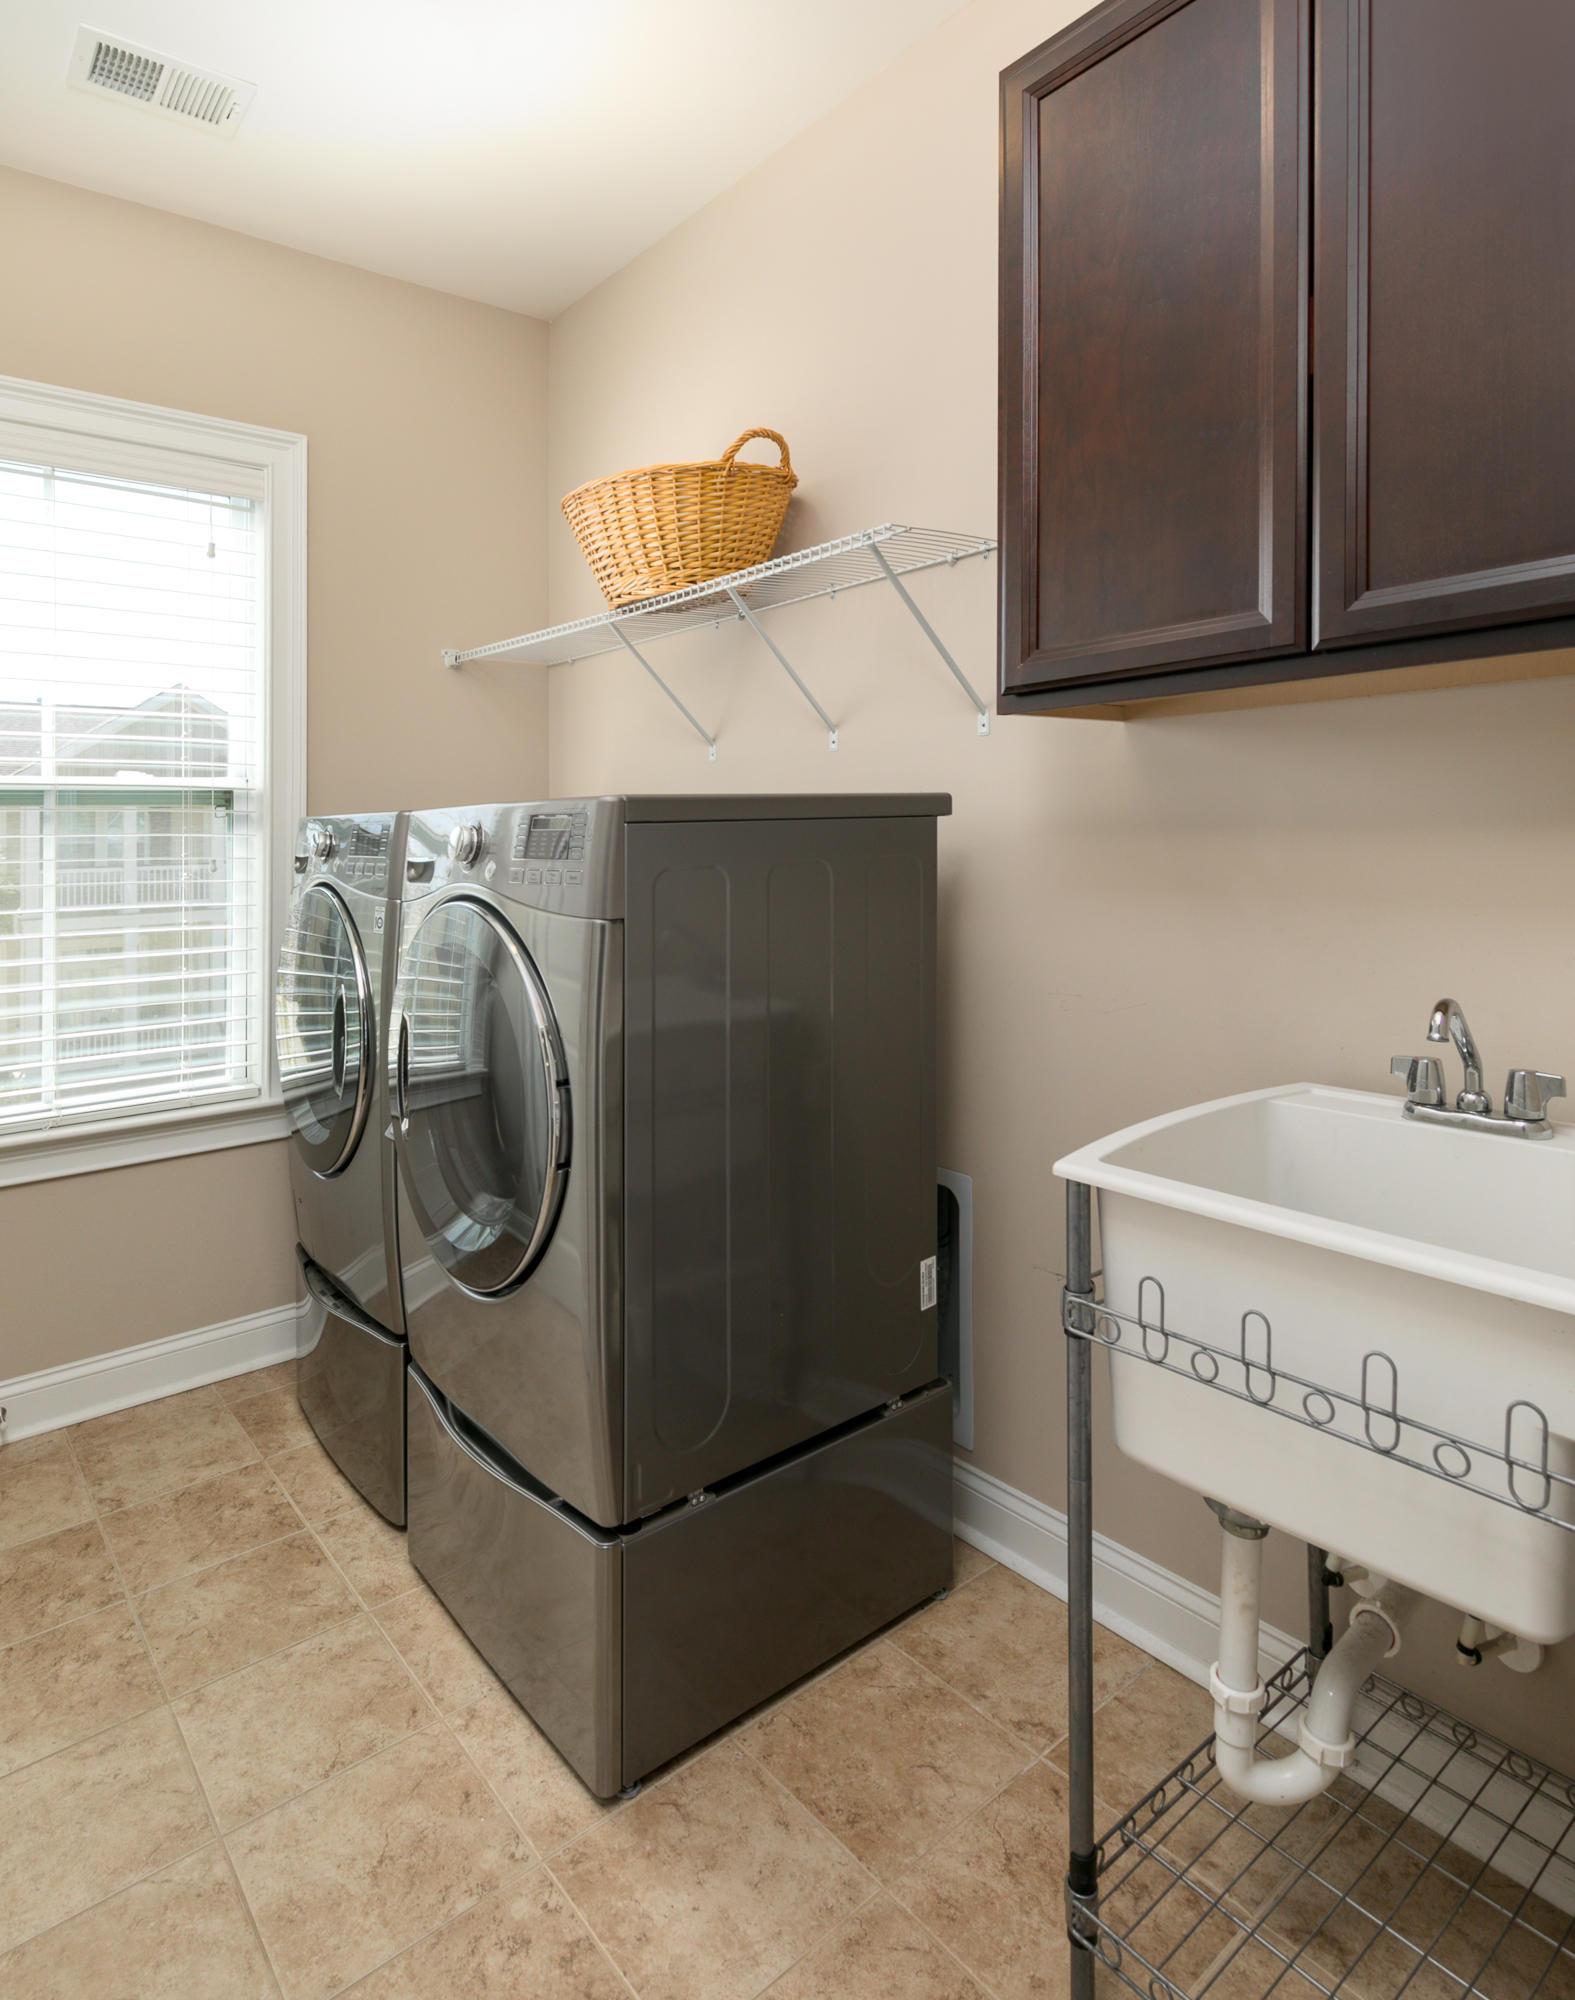 Carolina Park Homes For Sale - 1472 Croaton, Mount Pleasant, SC - 0